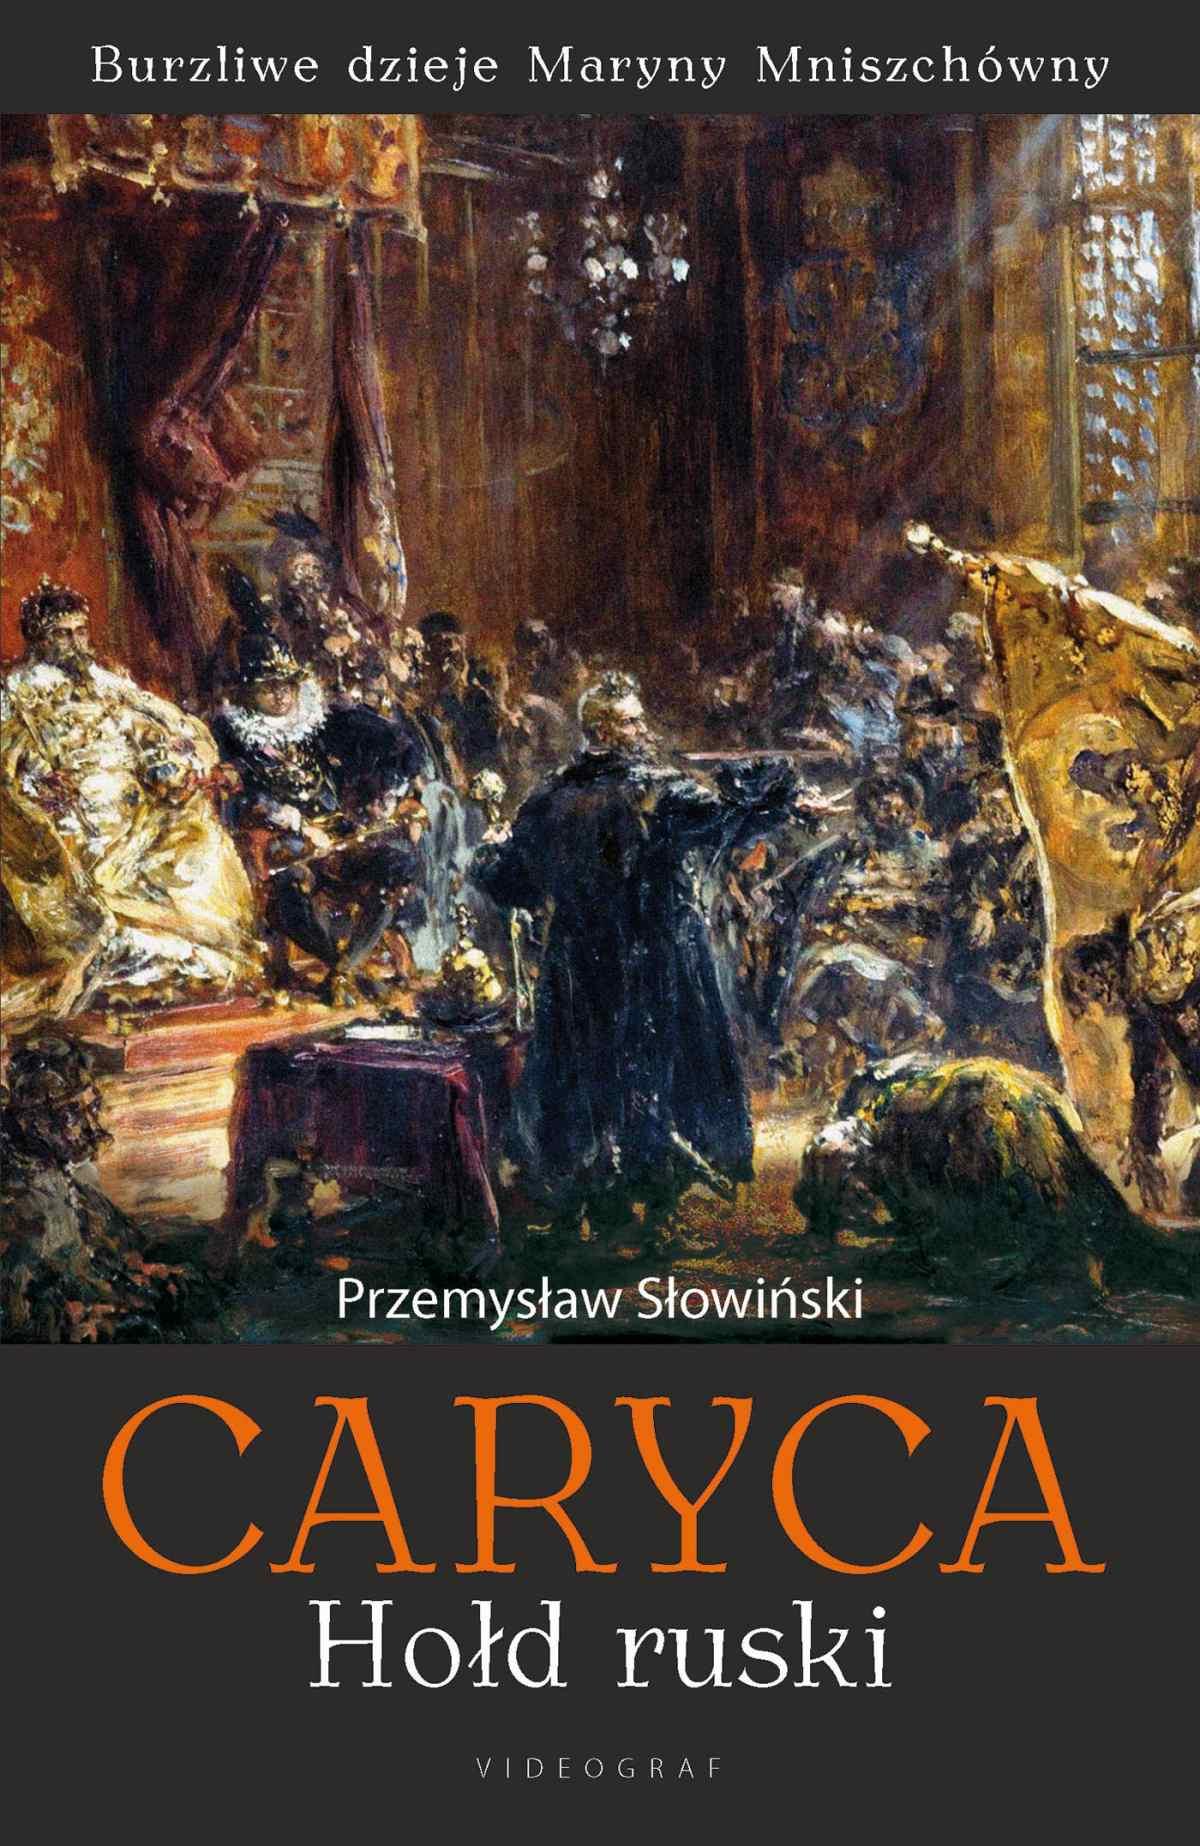 Caryca. Hołd ruski - Ebook (Książka EPUB) do pobrania w formacie EPUB